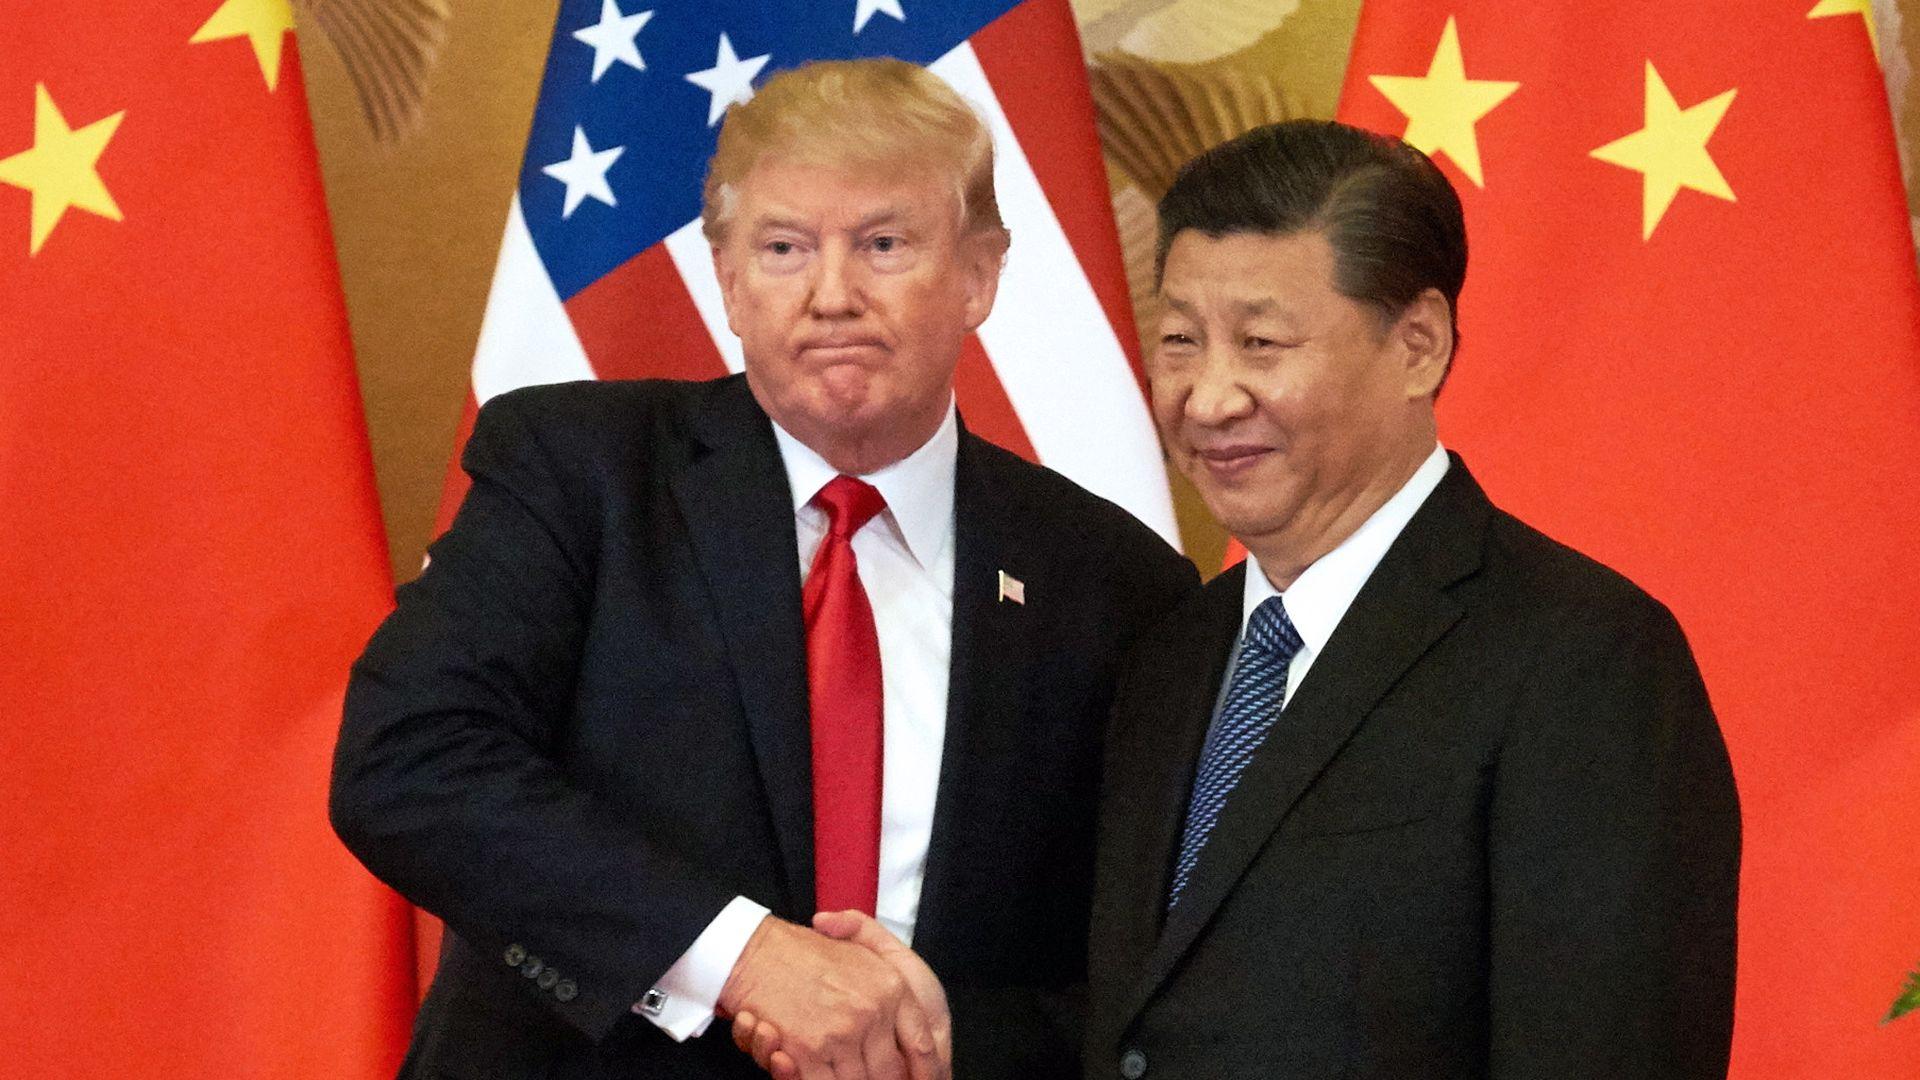 Trump and Xi Jingping.